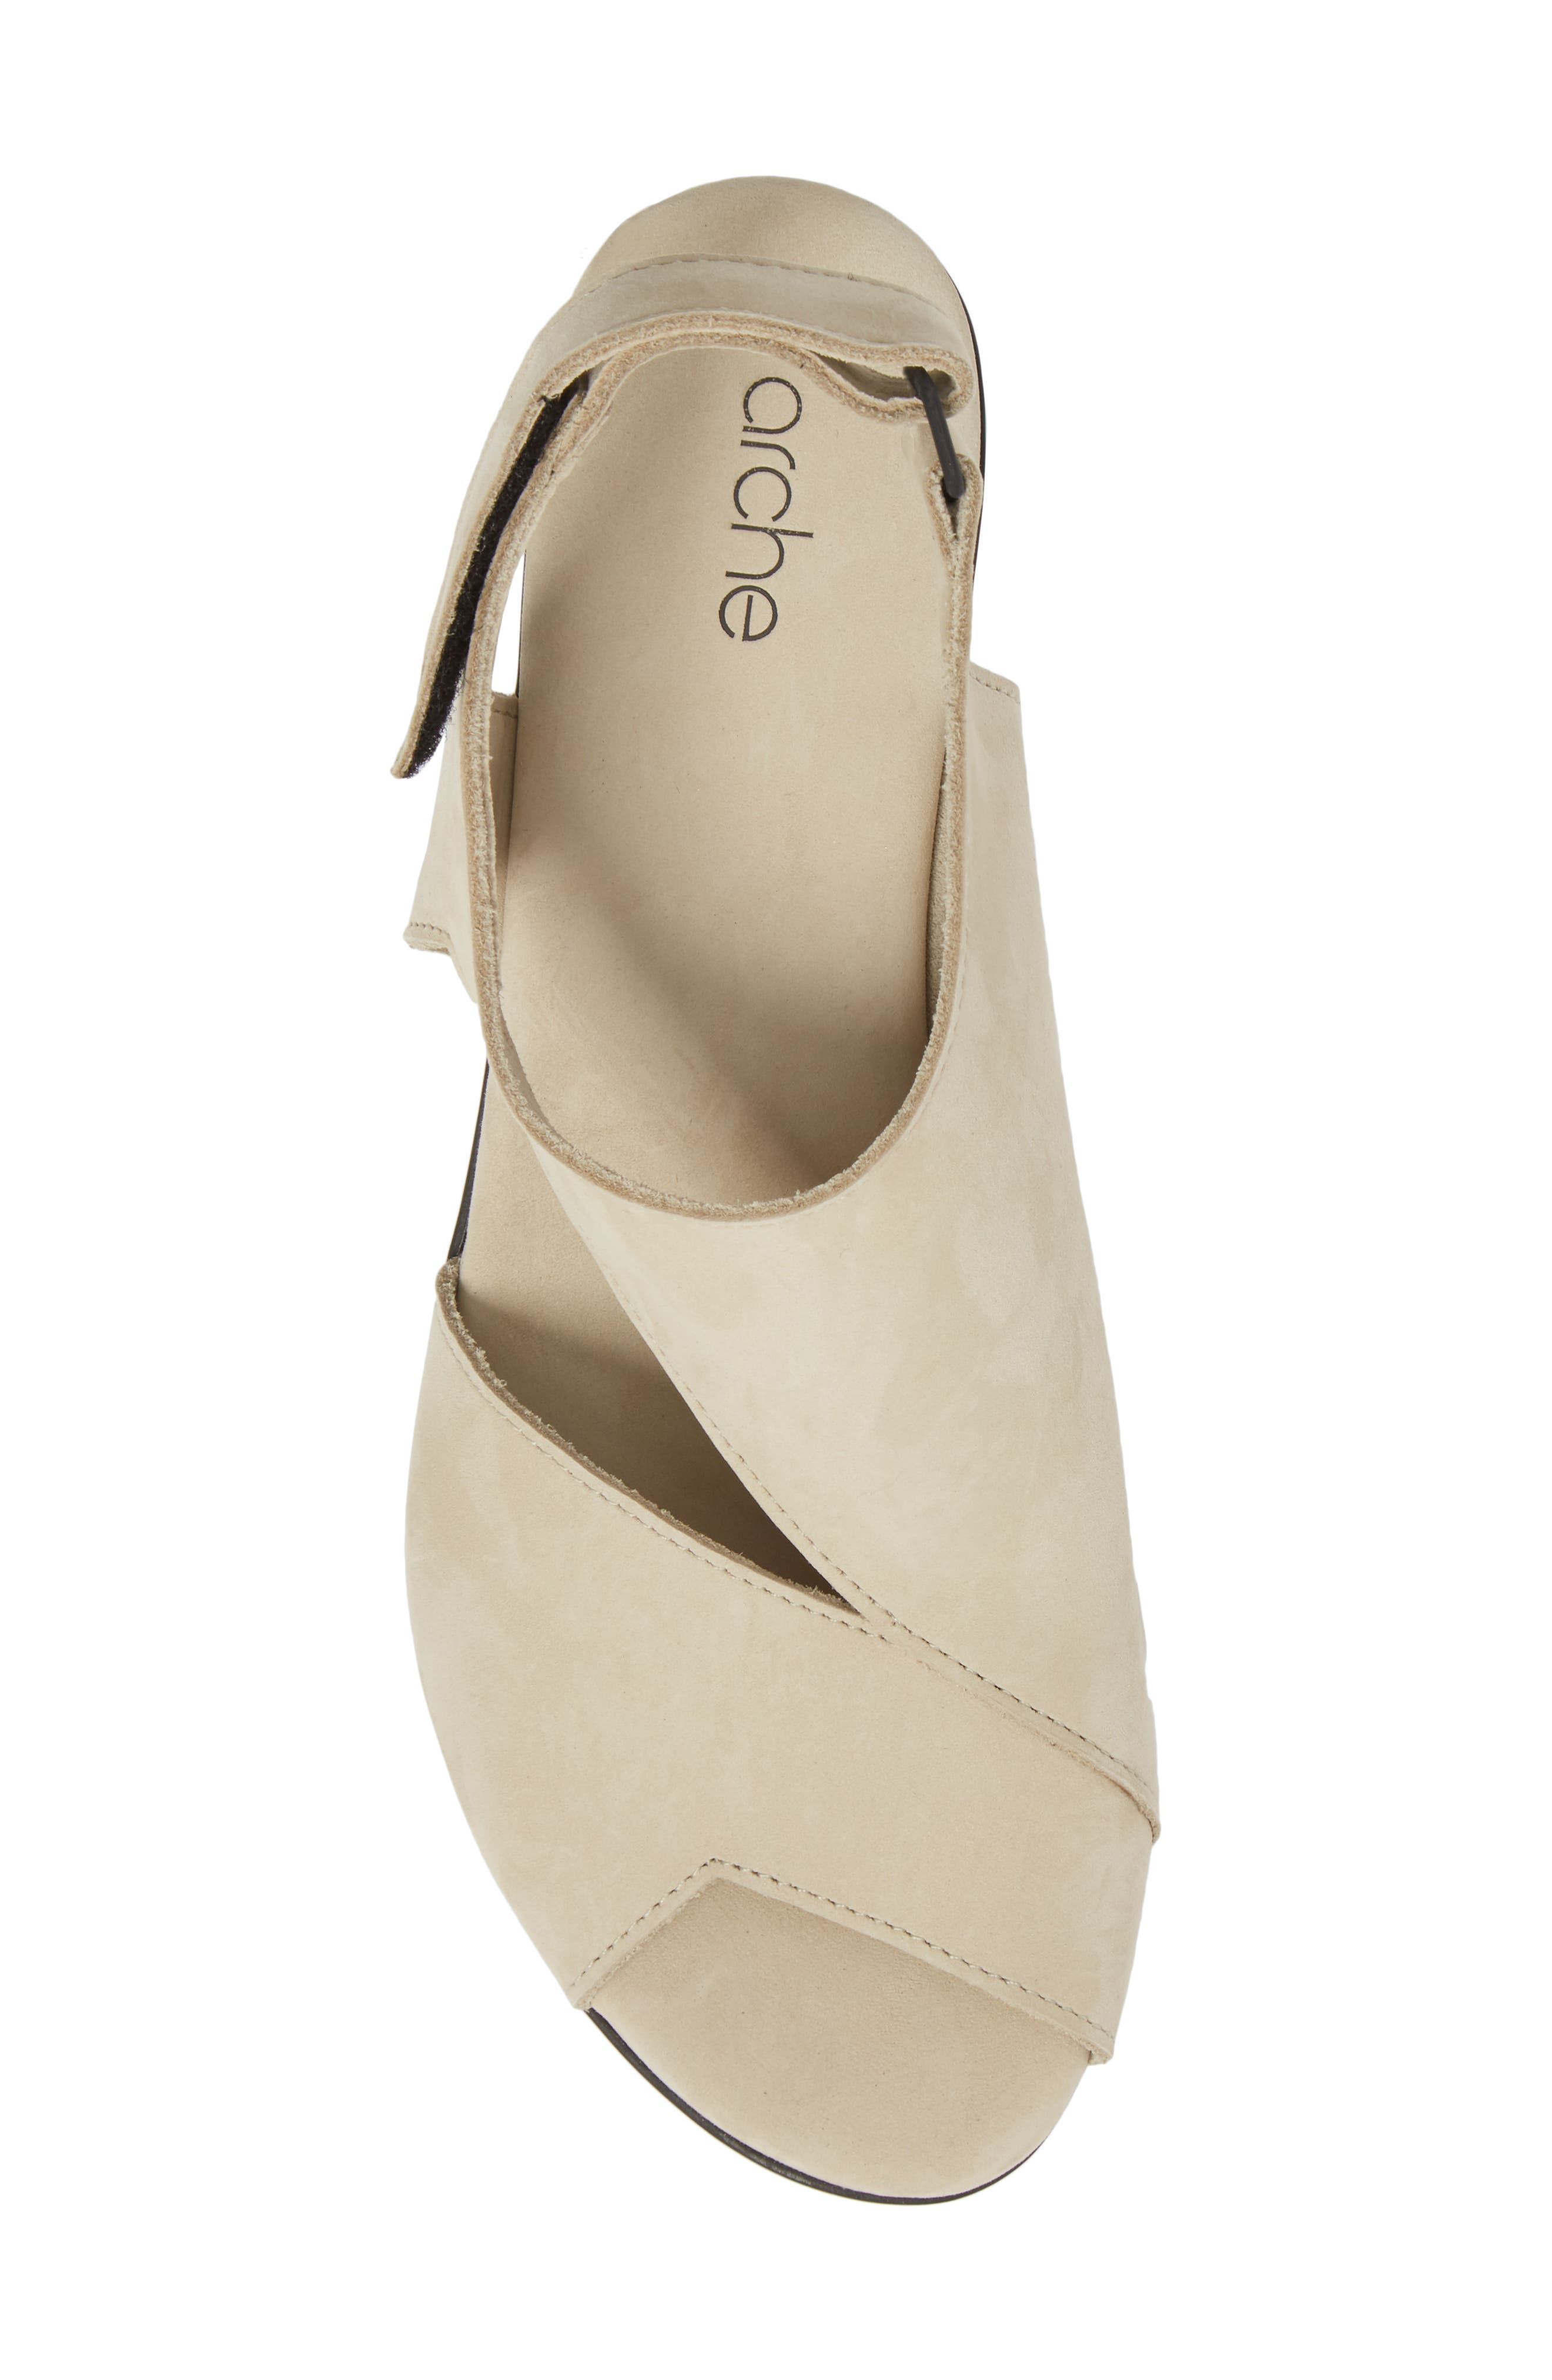 Obibbi Asymmetrical Slingback Sandal,                             Alternate thumbnail 10, color,